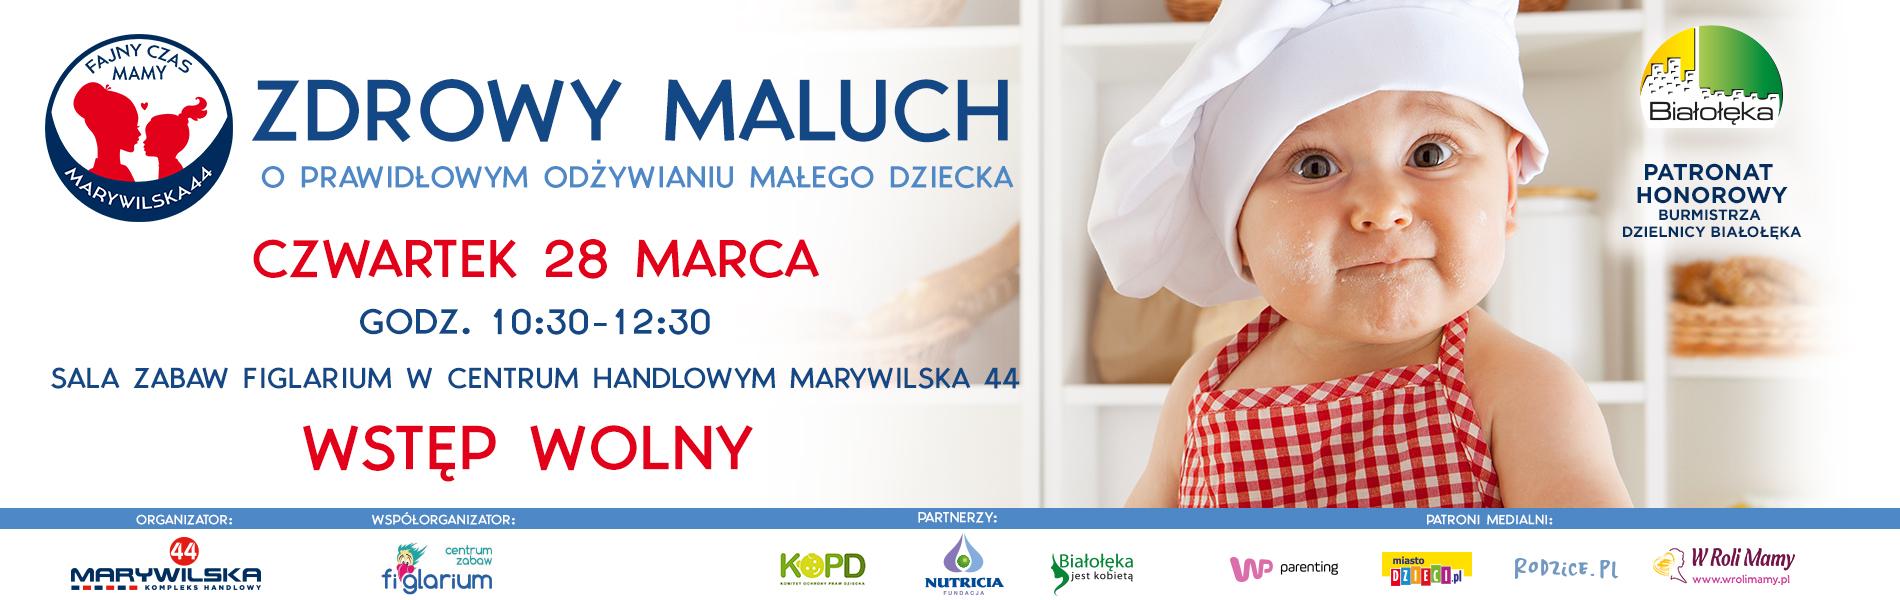 Marywilska - FAJNY CZAS